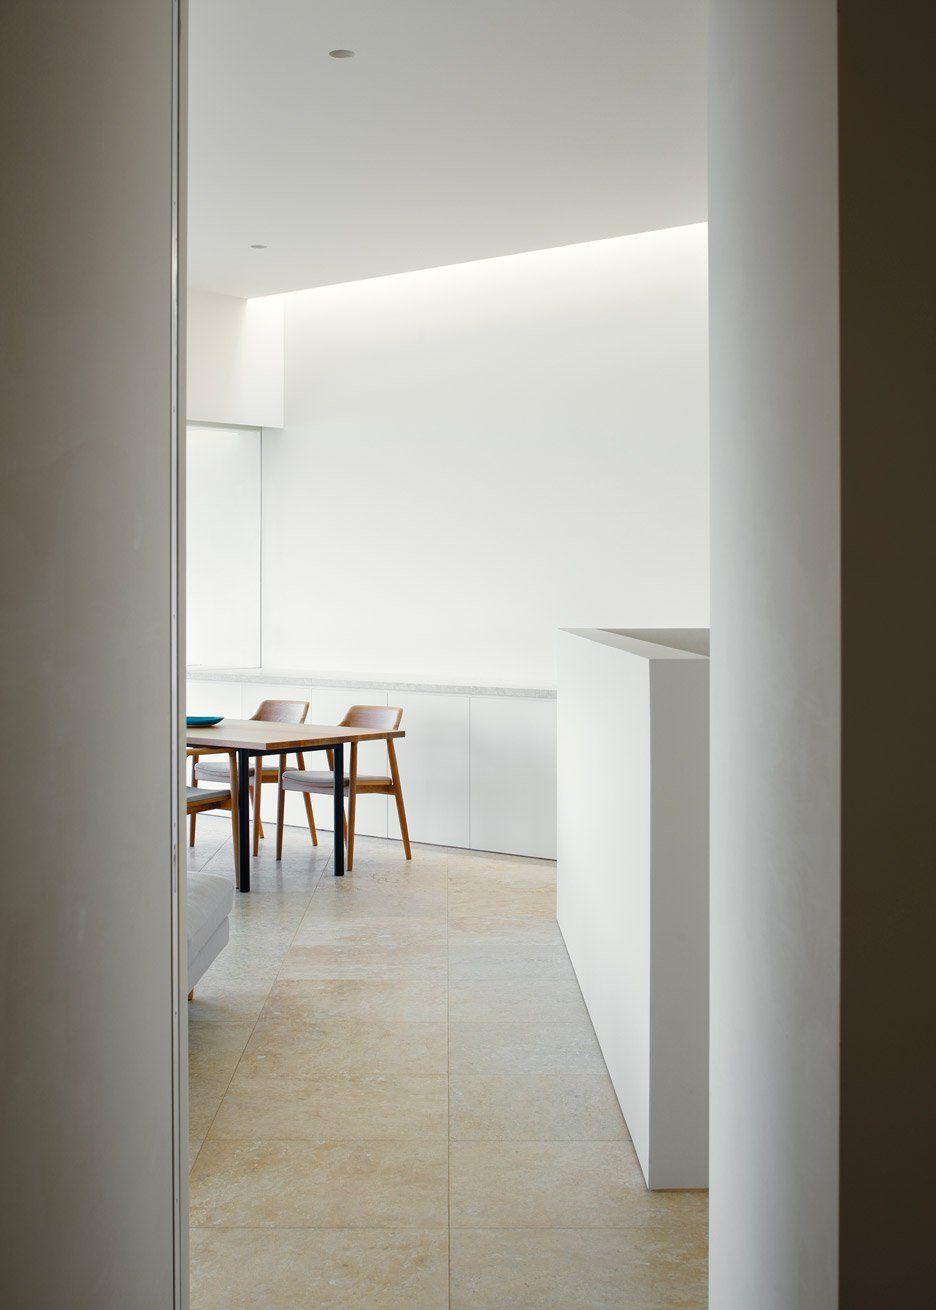 Okinawa House By John Pawson Holiday Home Architecture Japan · Singapore  HouseMinimalist ...